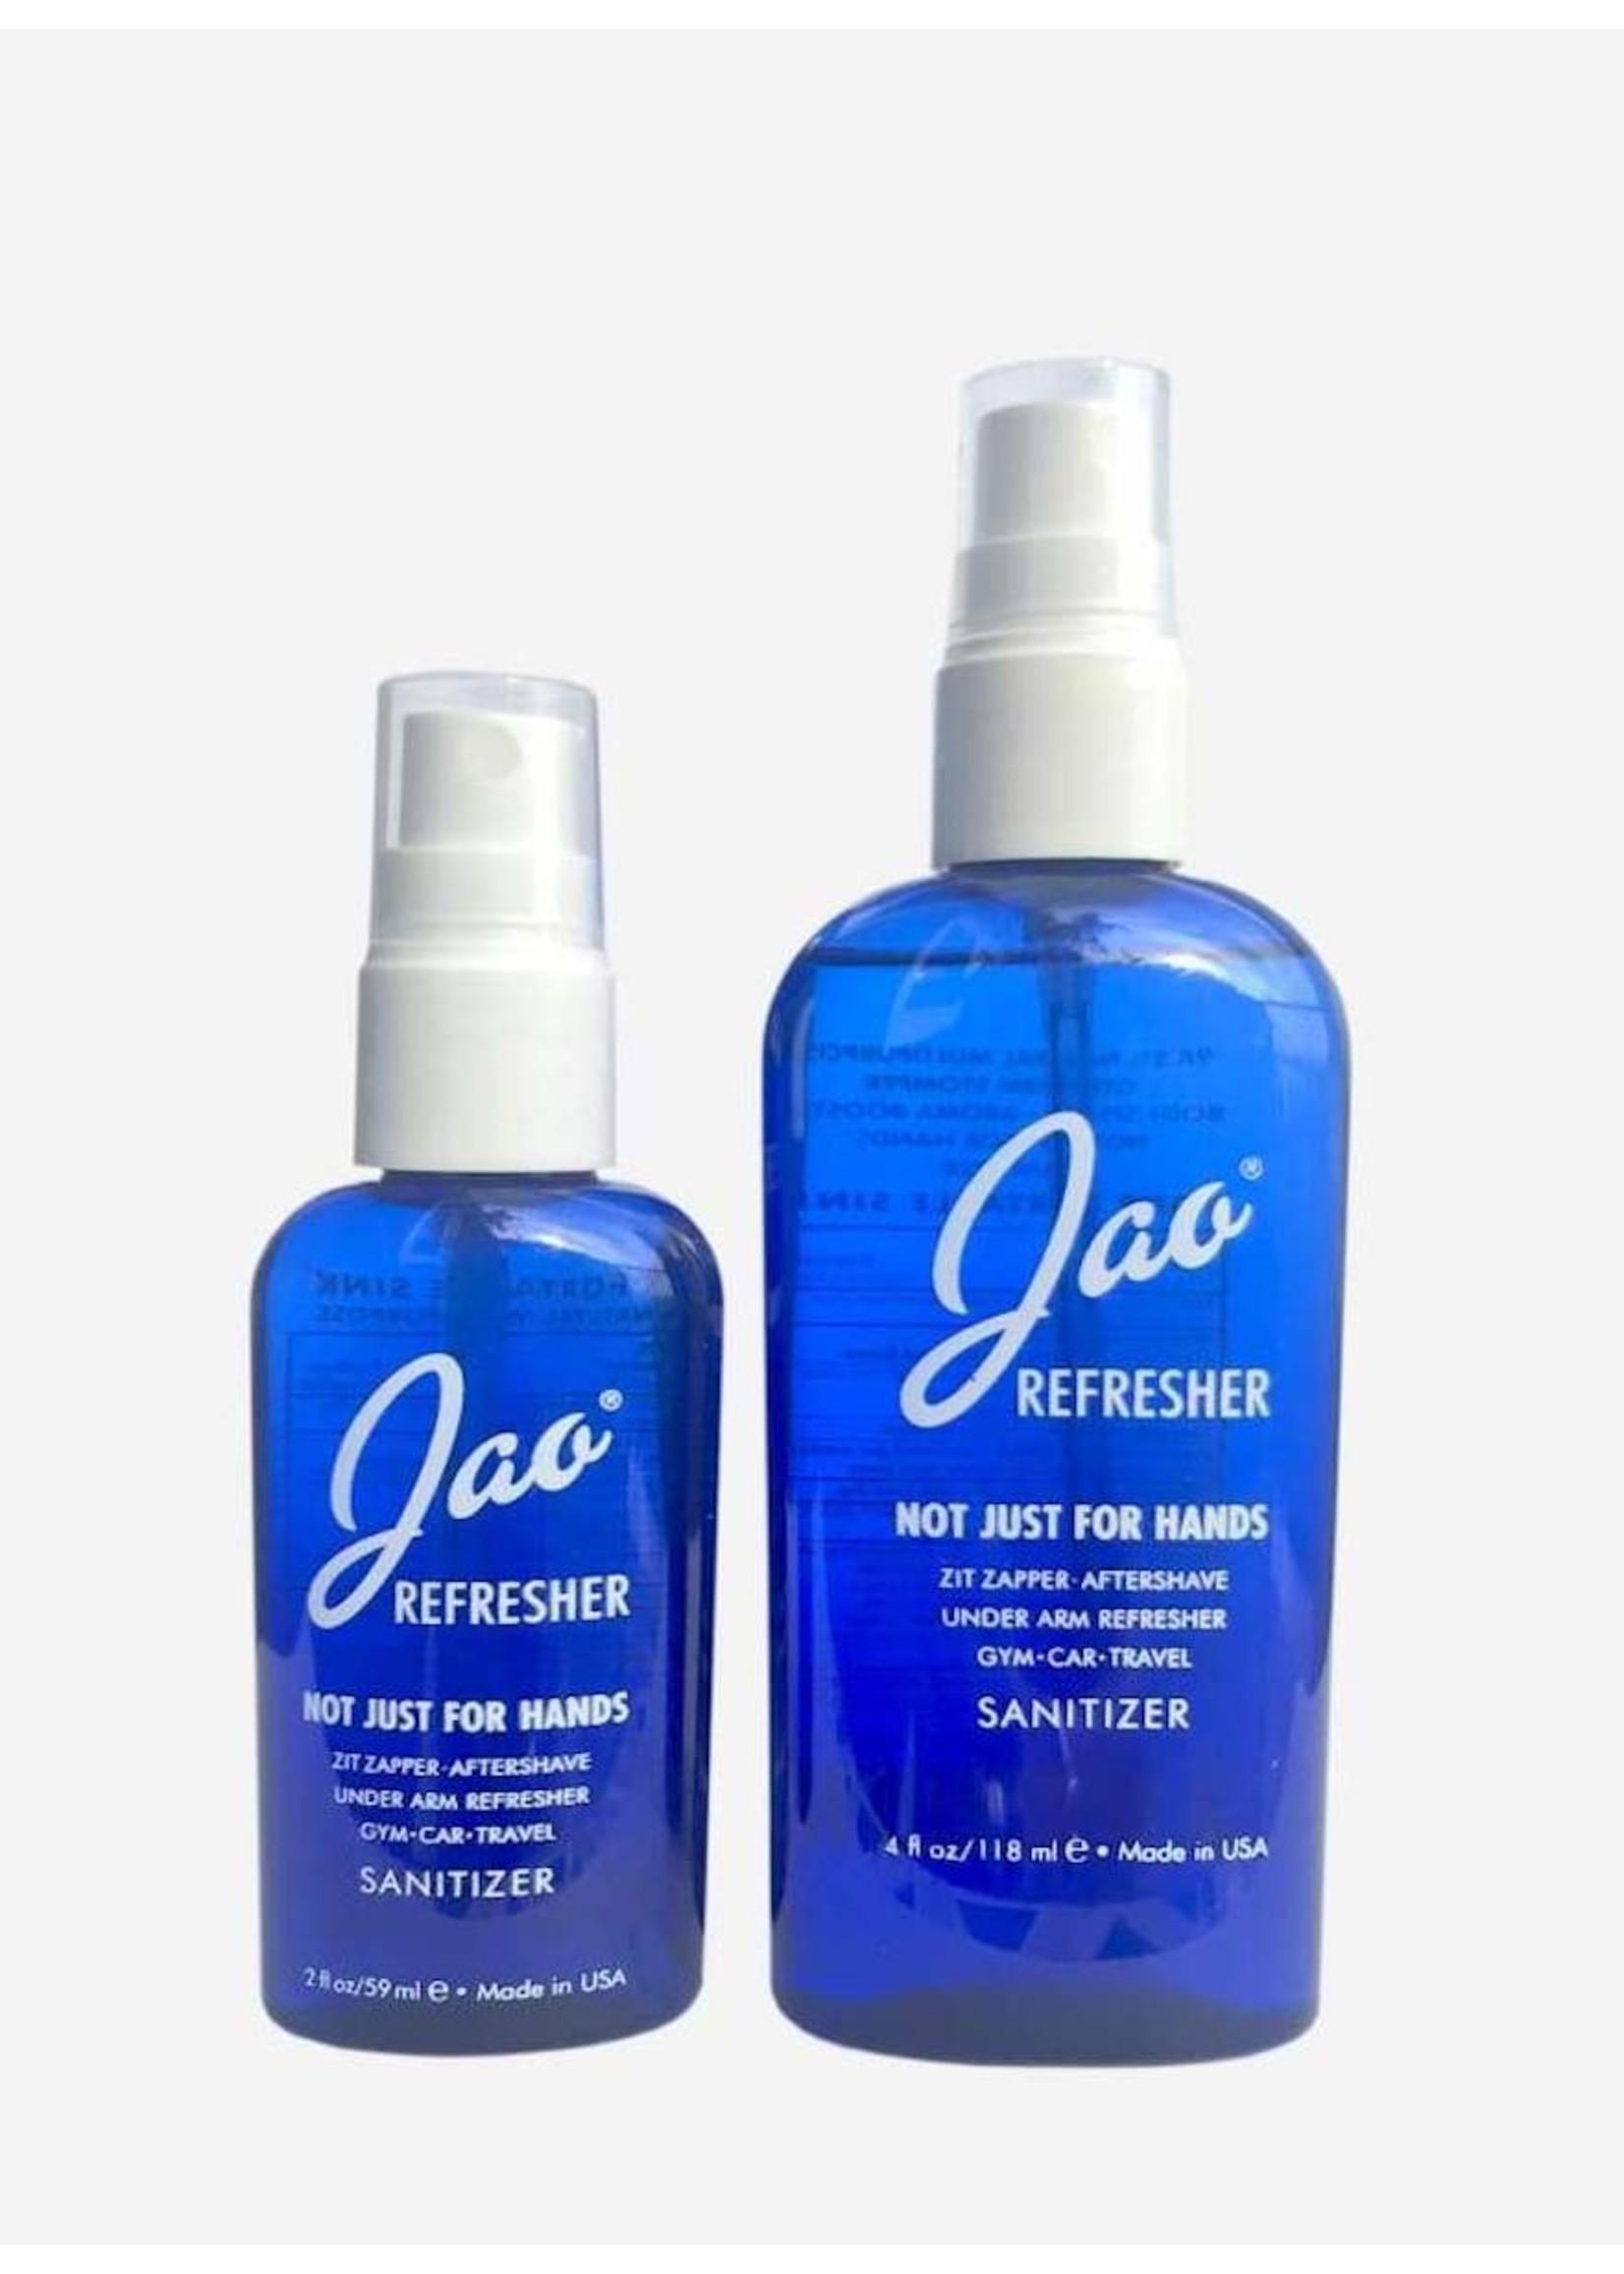 Jao Brand Refresher Hand Sanitizer